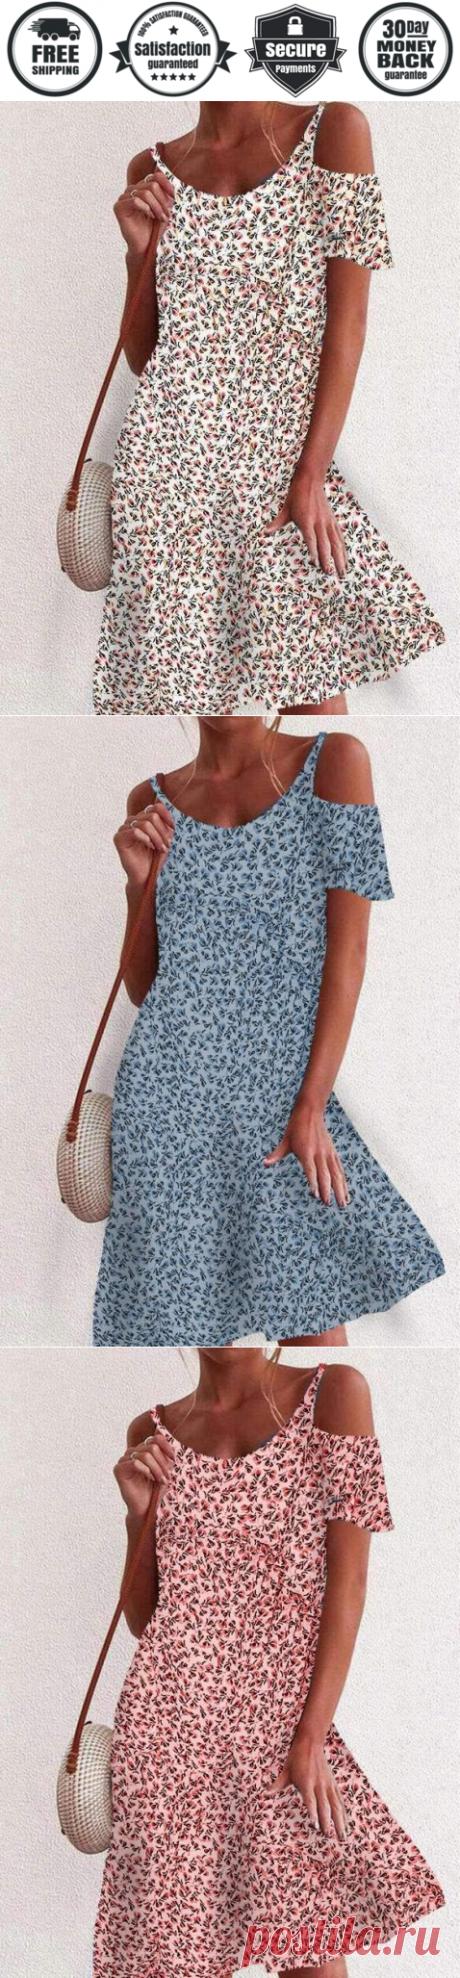 Fashion Floral print Round neck Vest Off shoulder Short sleeve Shift D - Cicicloth